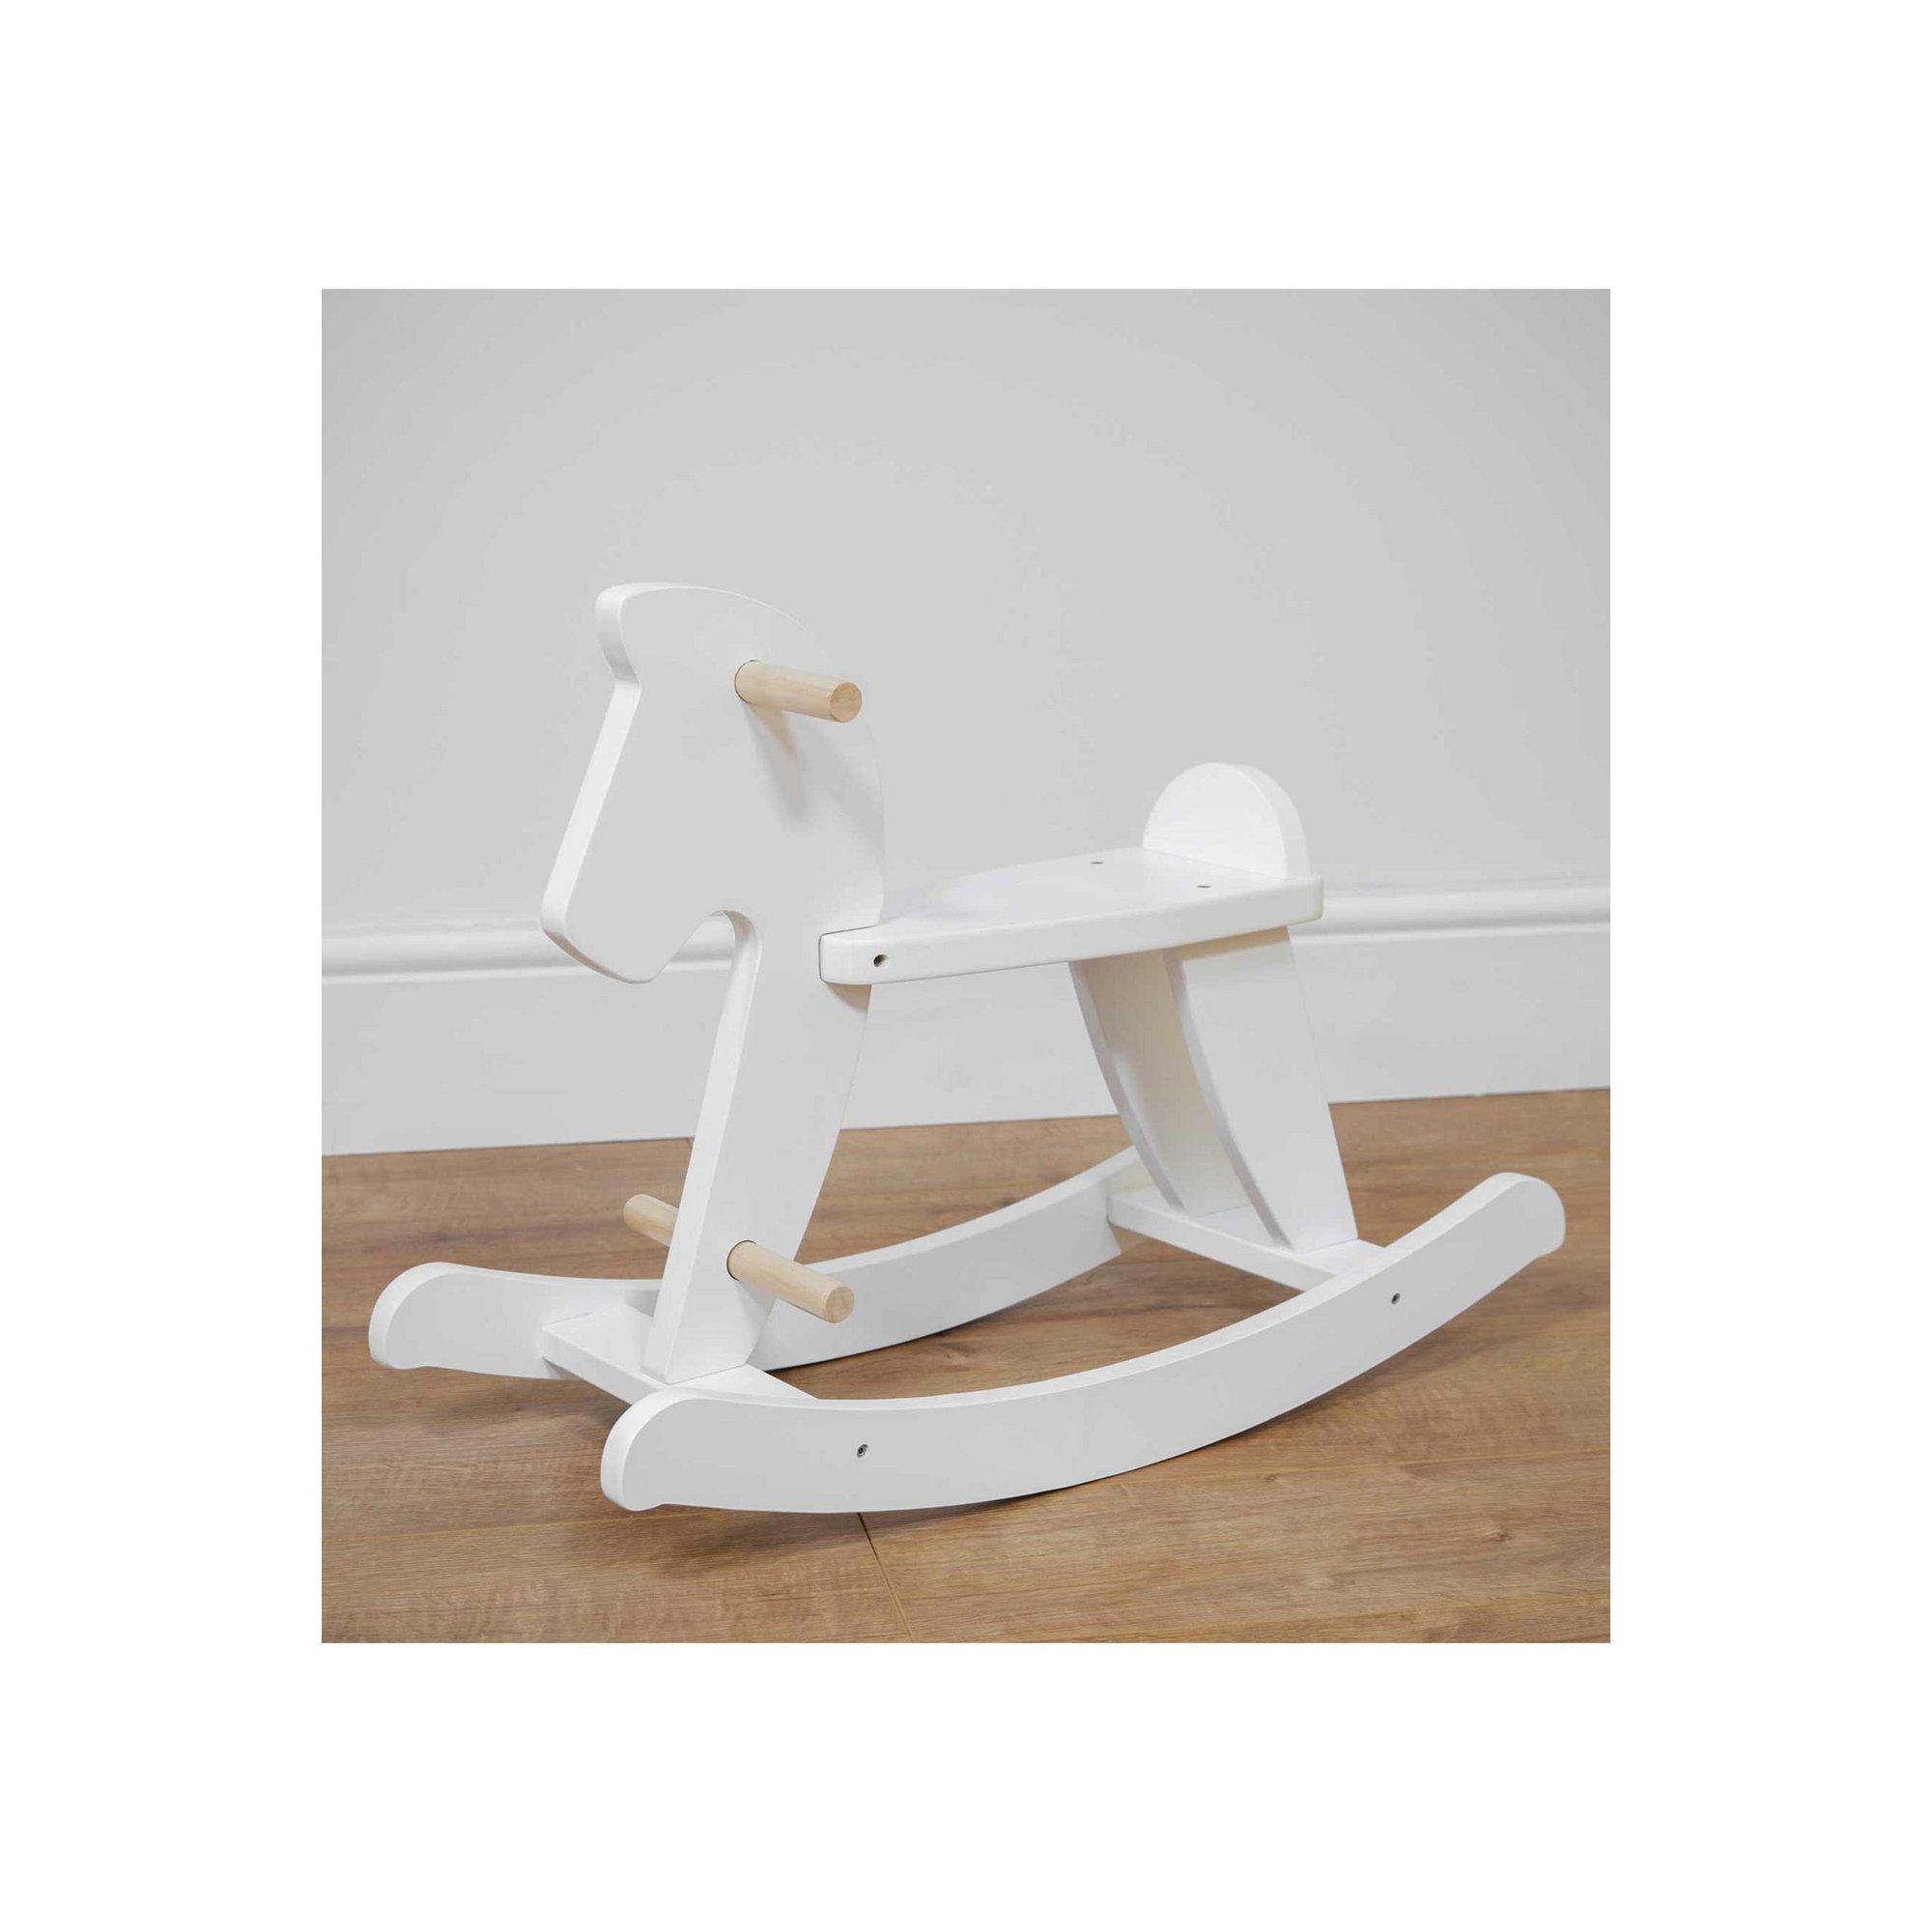 Image of Bambino White Wooden Rocking Horse